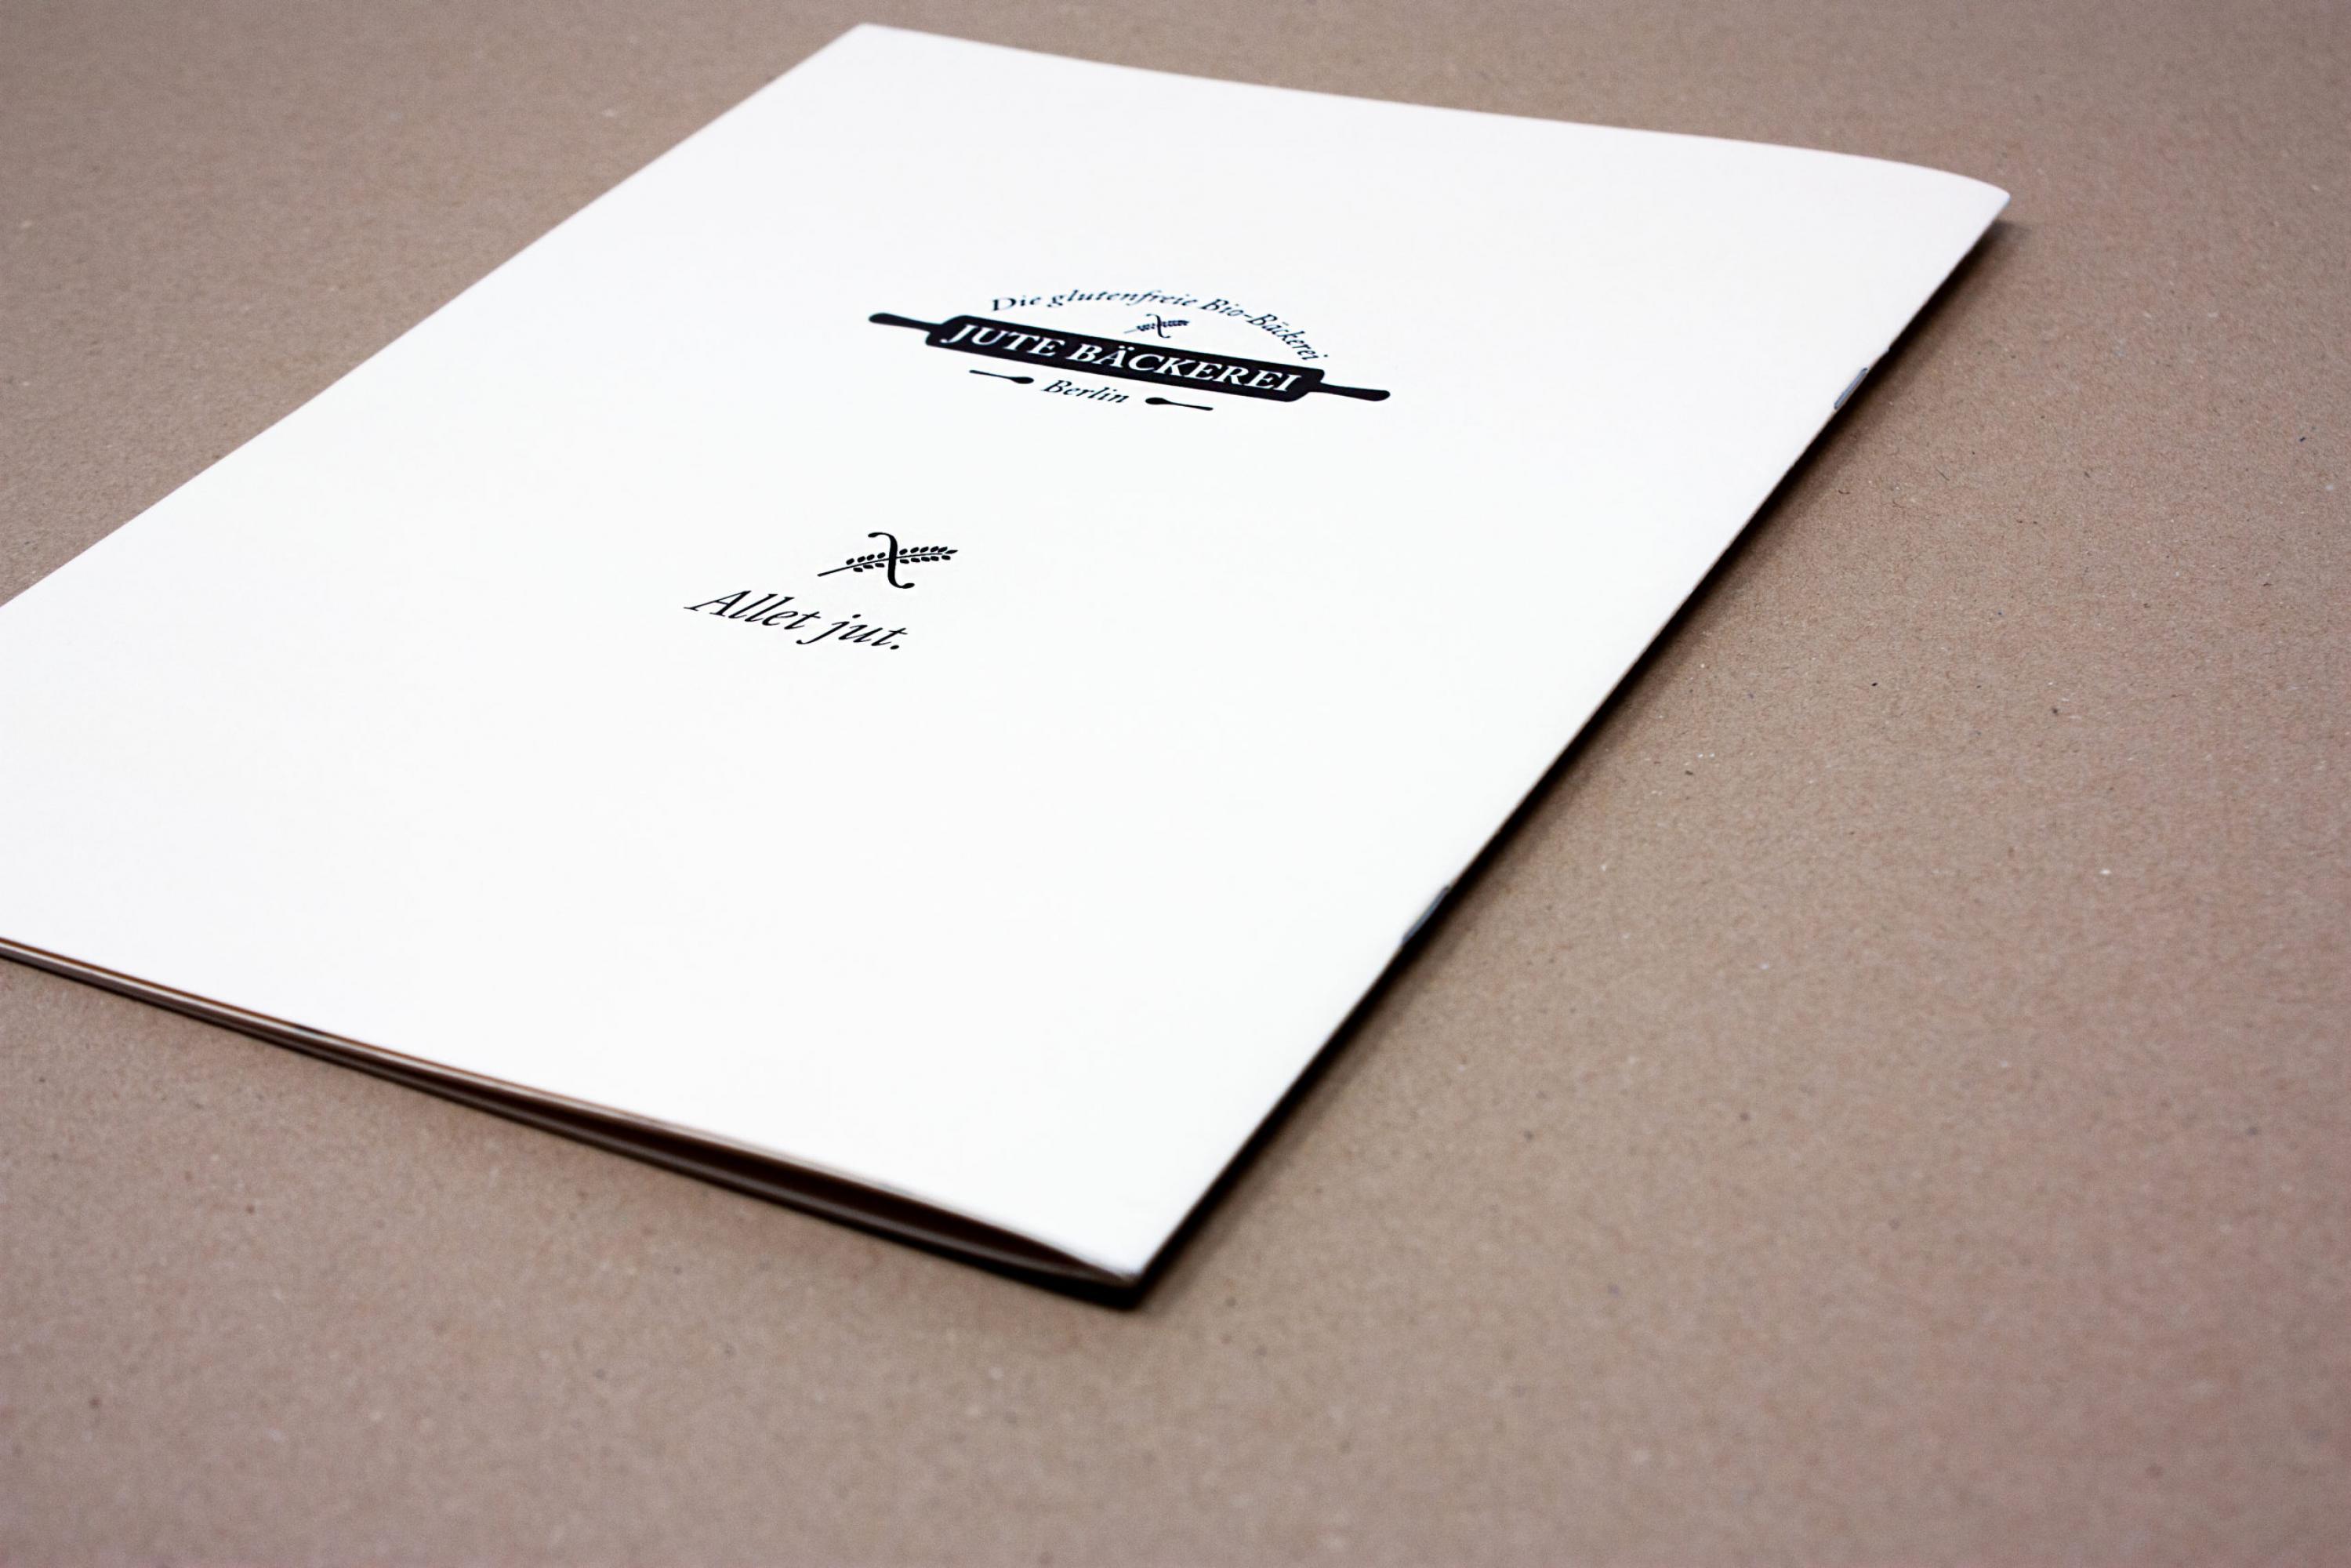 Print-broschuere-jute-baeckerei-formlos-corporate-design-5